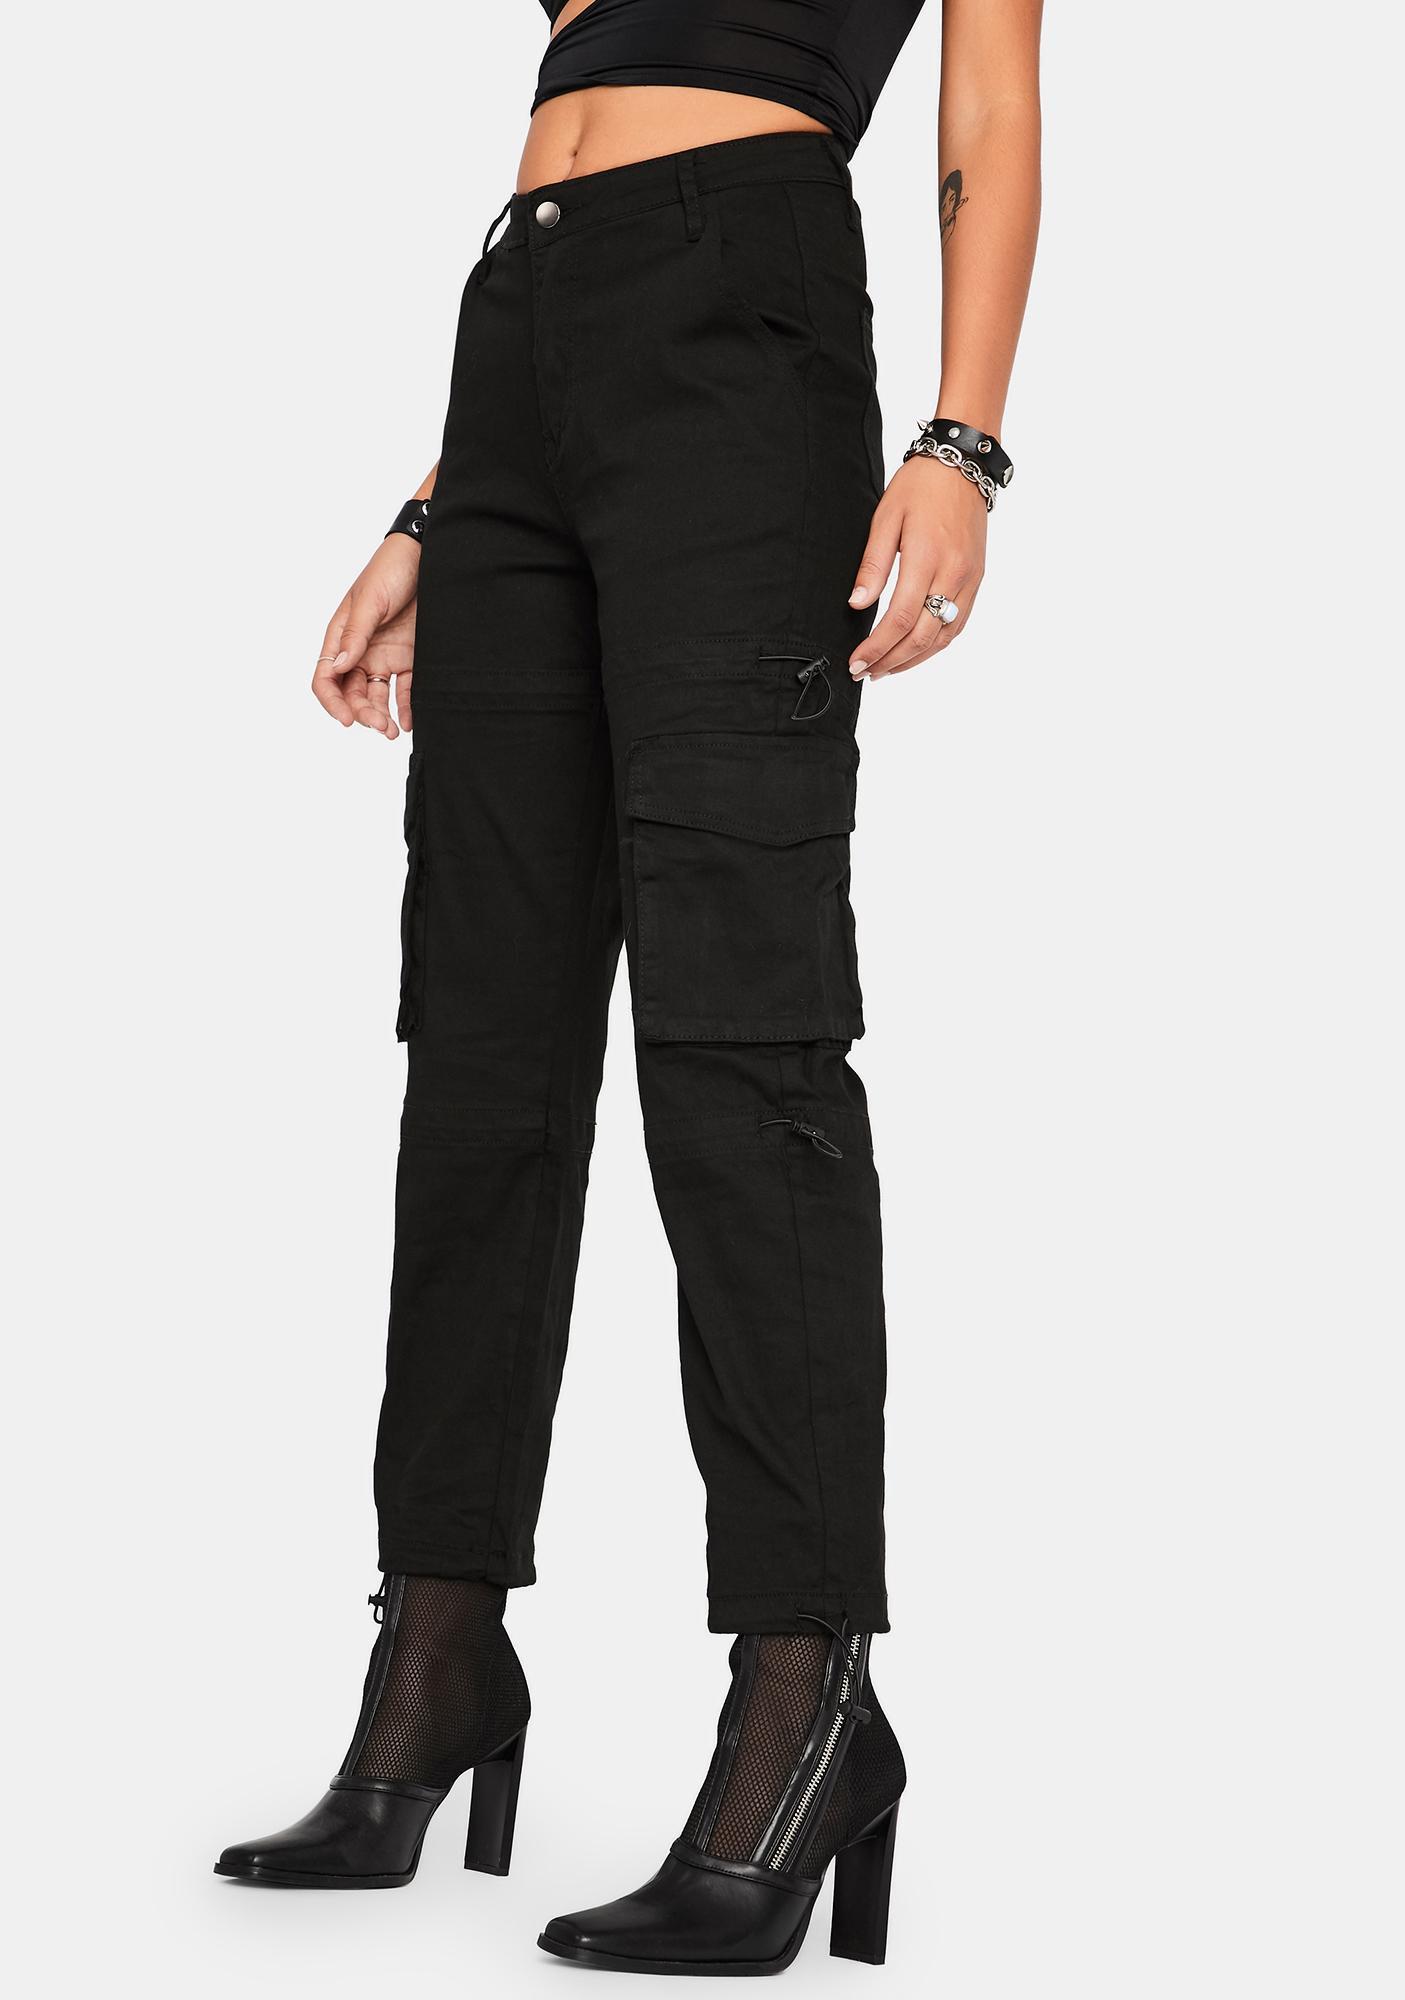 Worldwide Baddie Cargo Pants